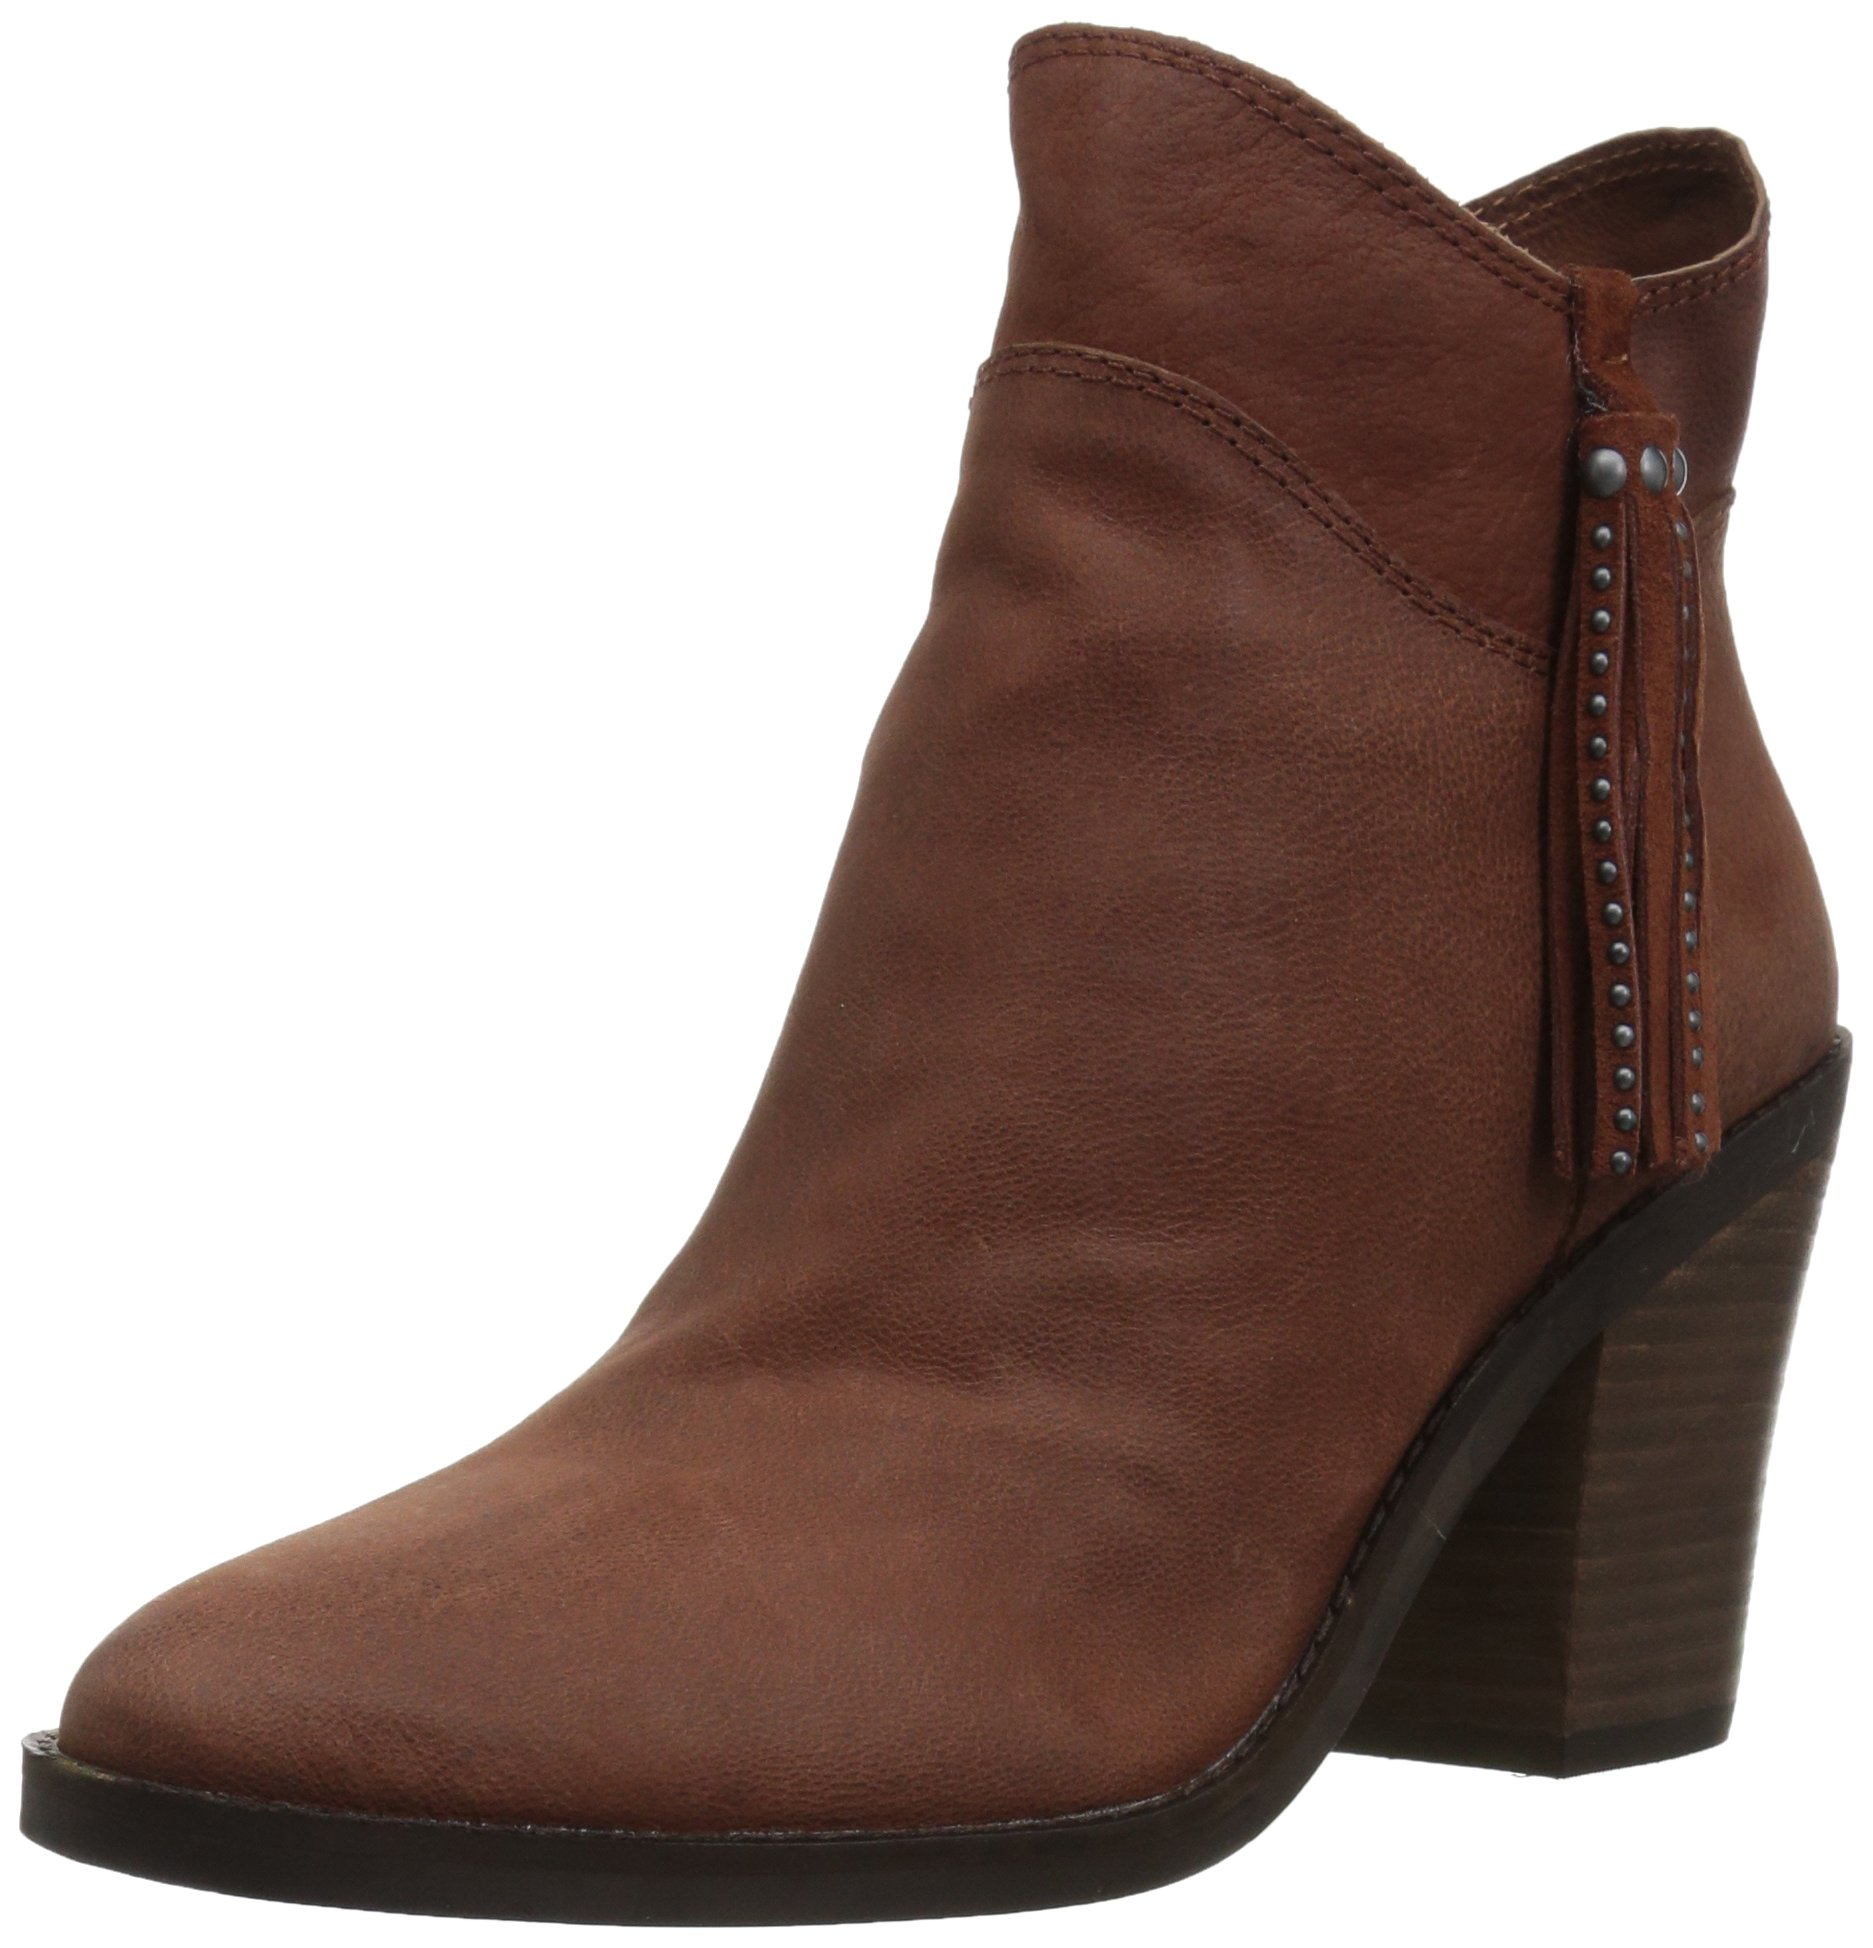 Lucky Brand Women's Pavel Ankle Boot, Rye, 8.5 Medium US